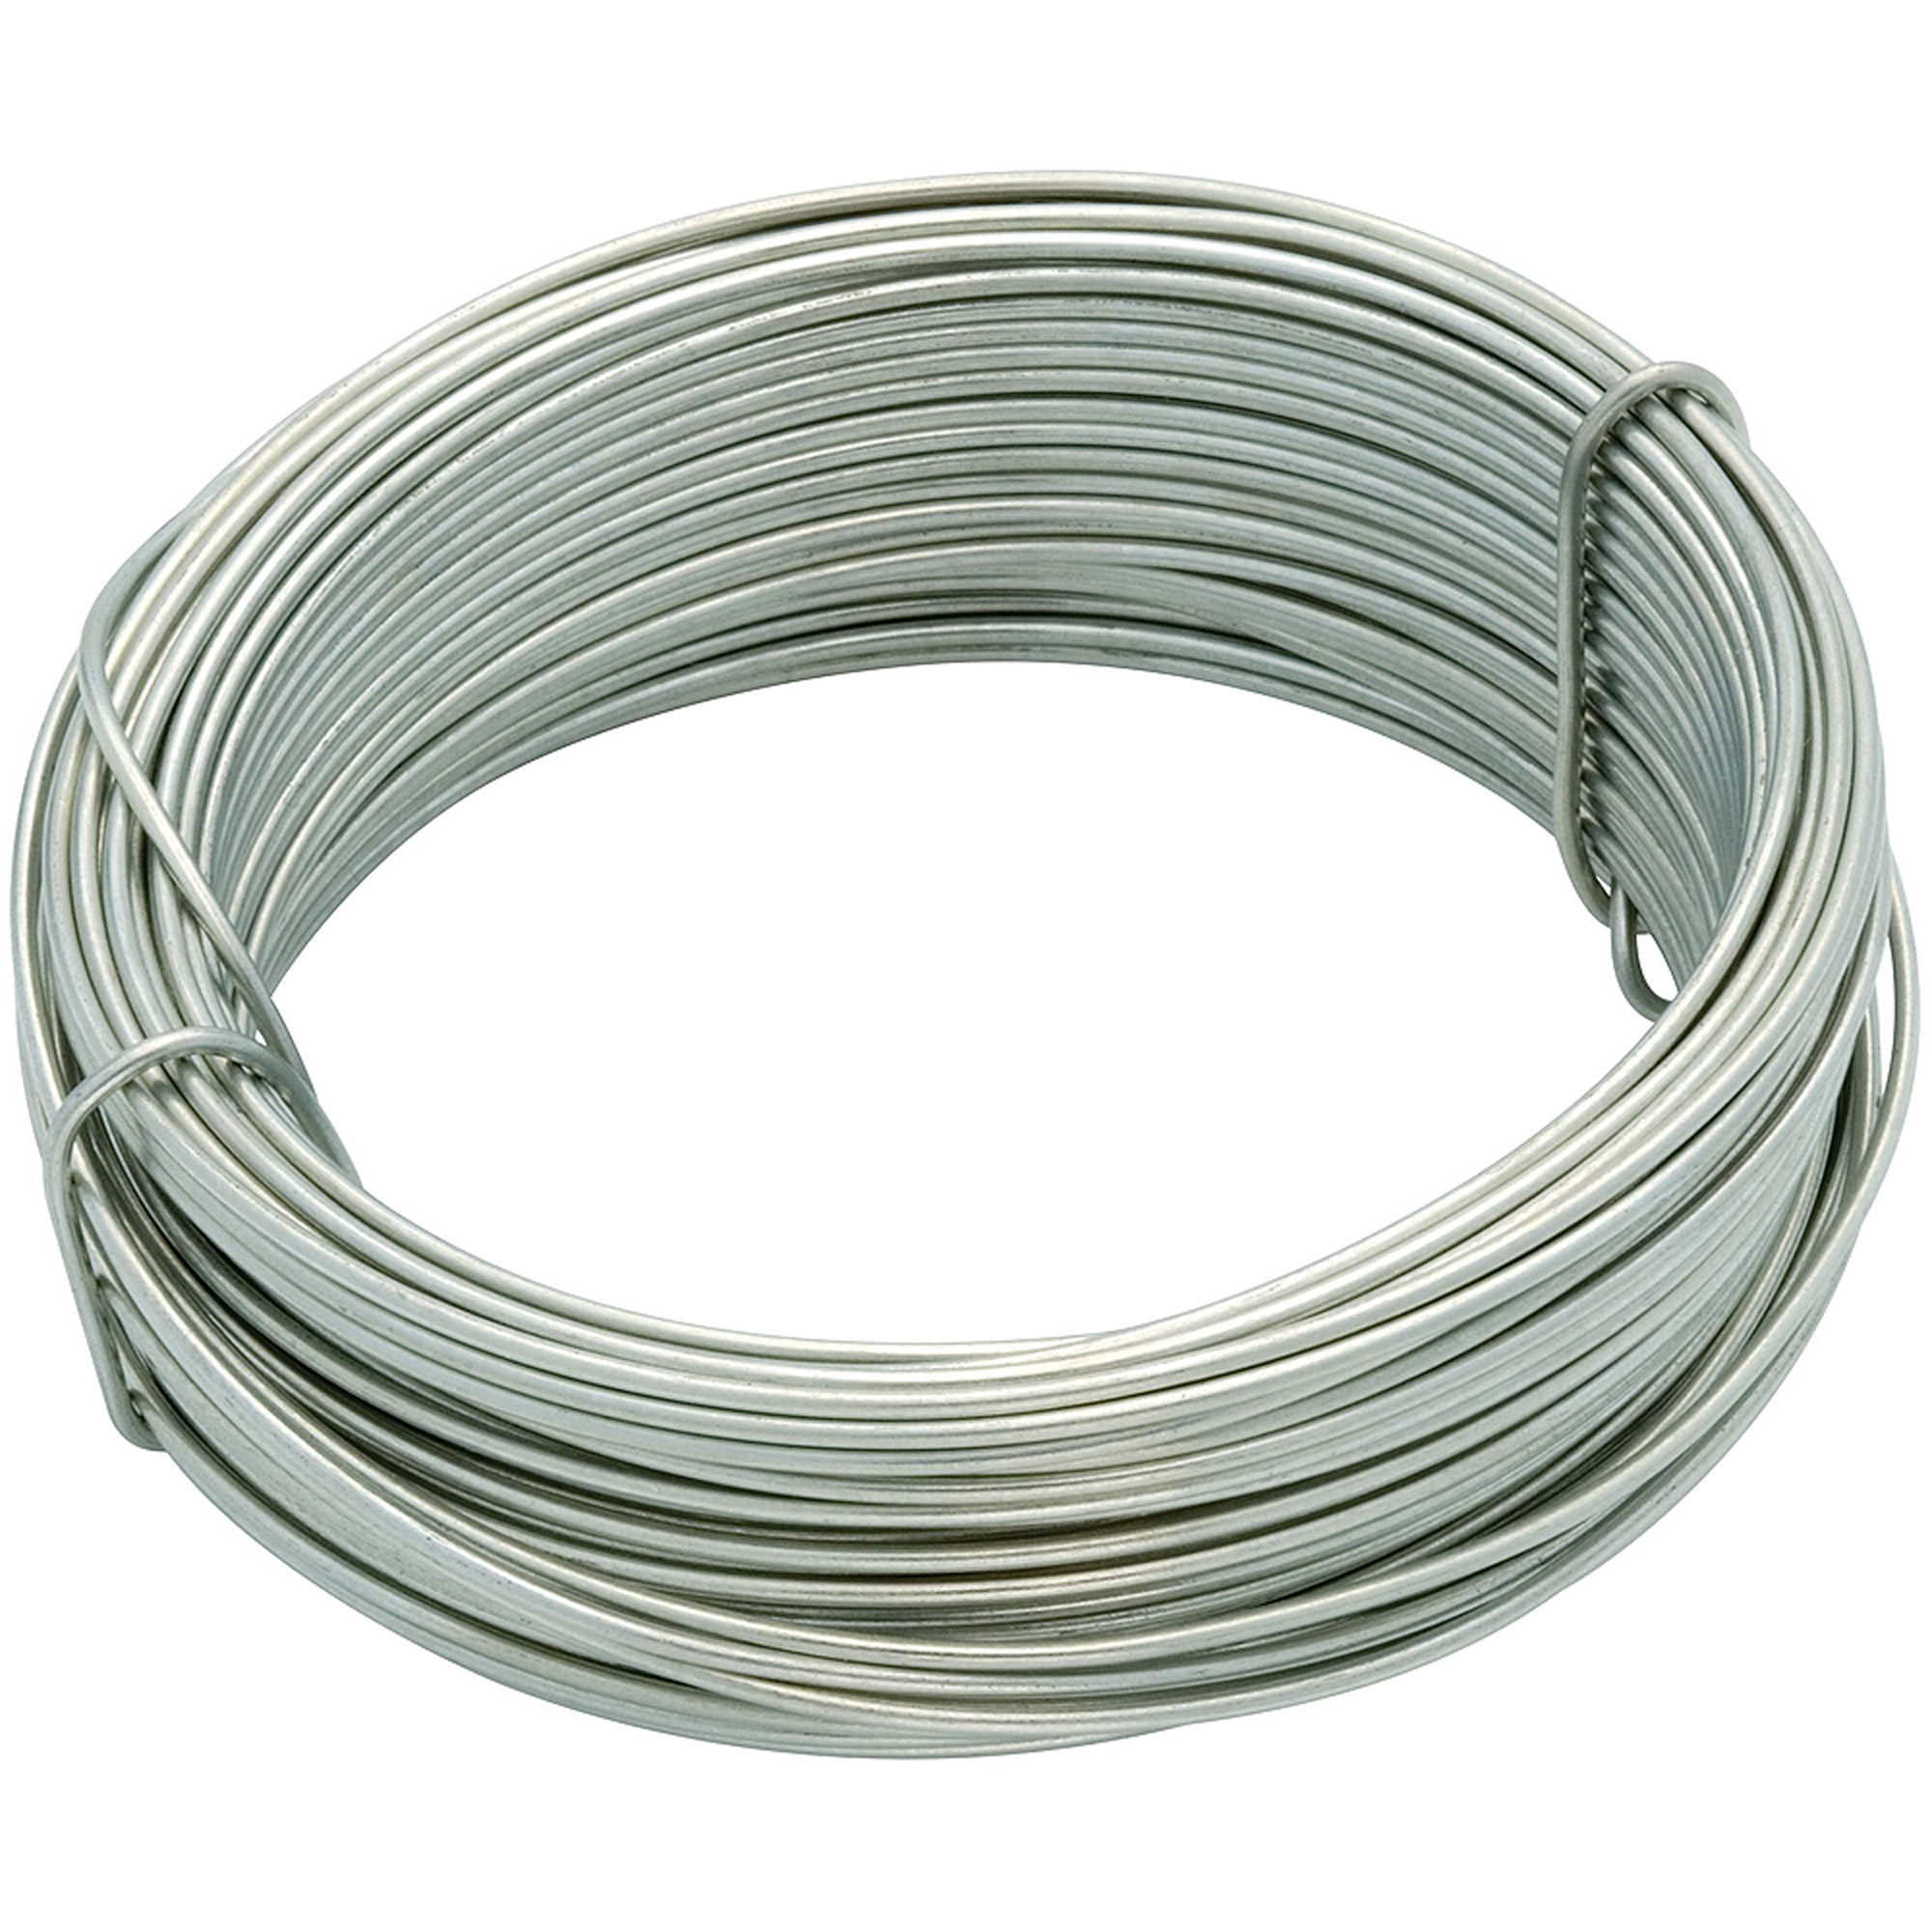 Arrow 19-Gauge Picture Wire